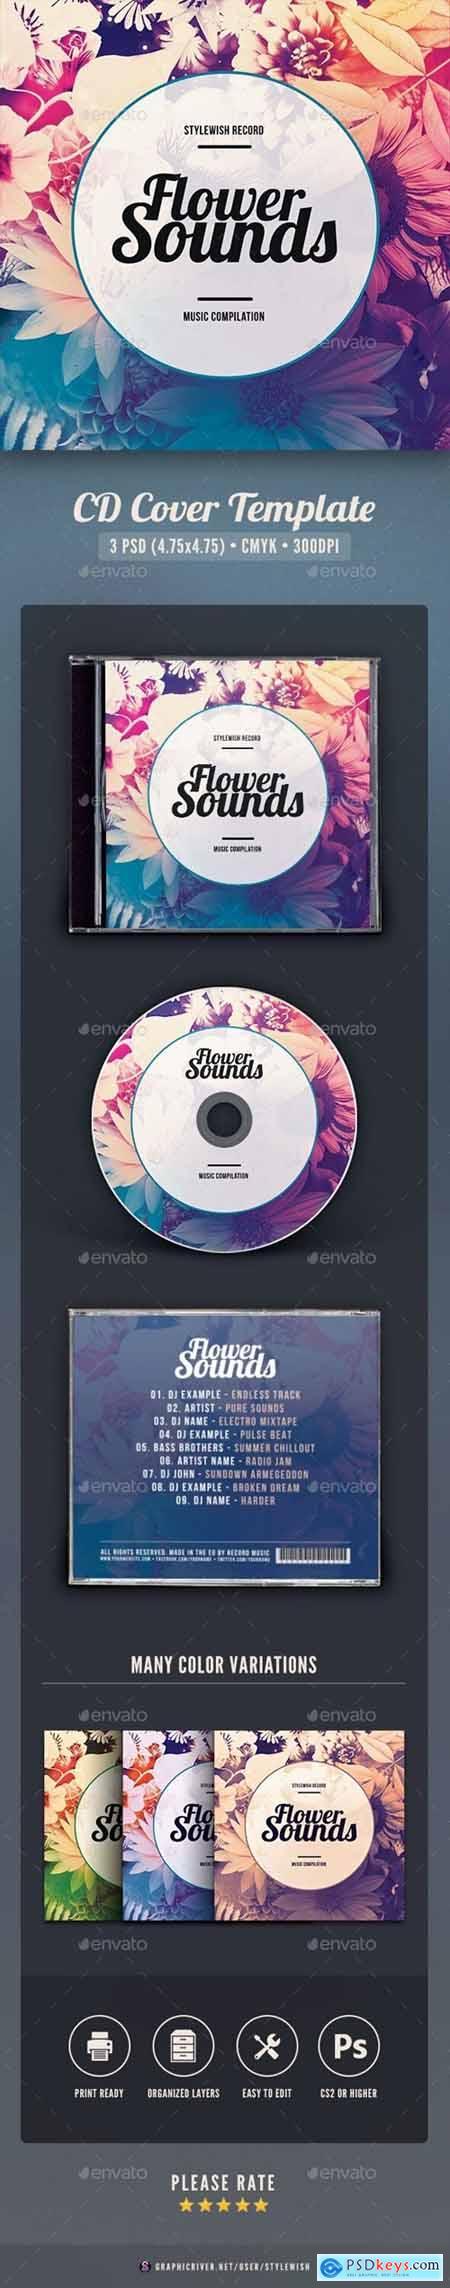 Flower Sounds CD Cover Artwork 30180393